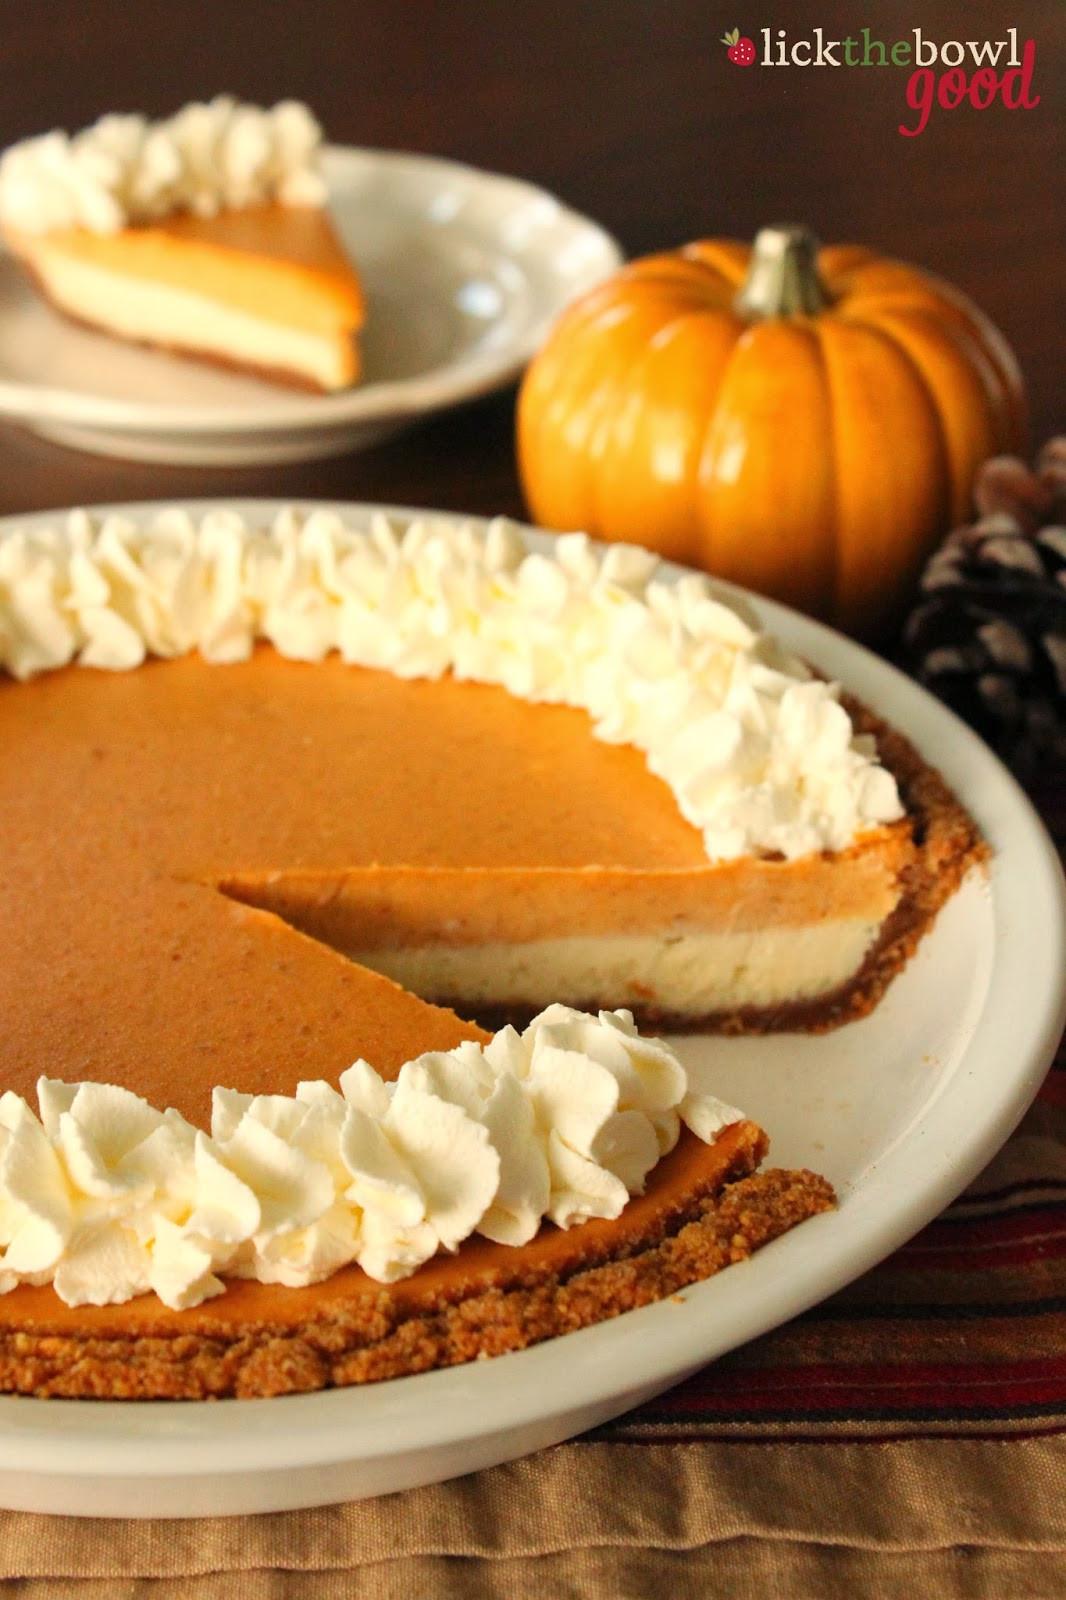 Pumpkin Pie Thanksgiving  Lick The Bowl Good Happy Thanksgiving 2013